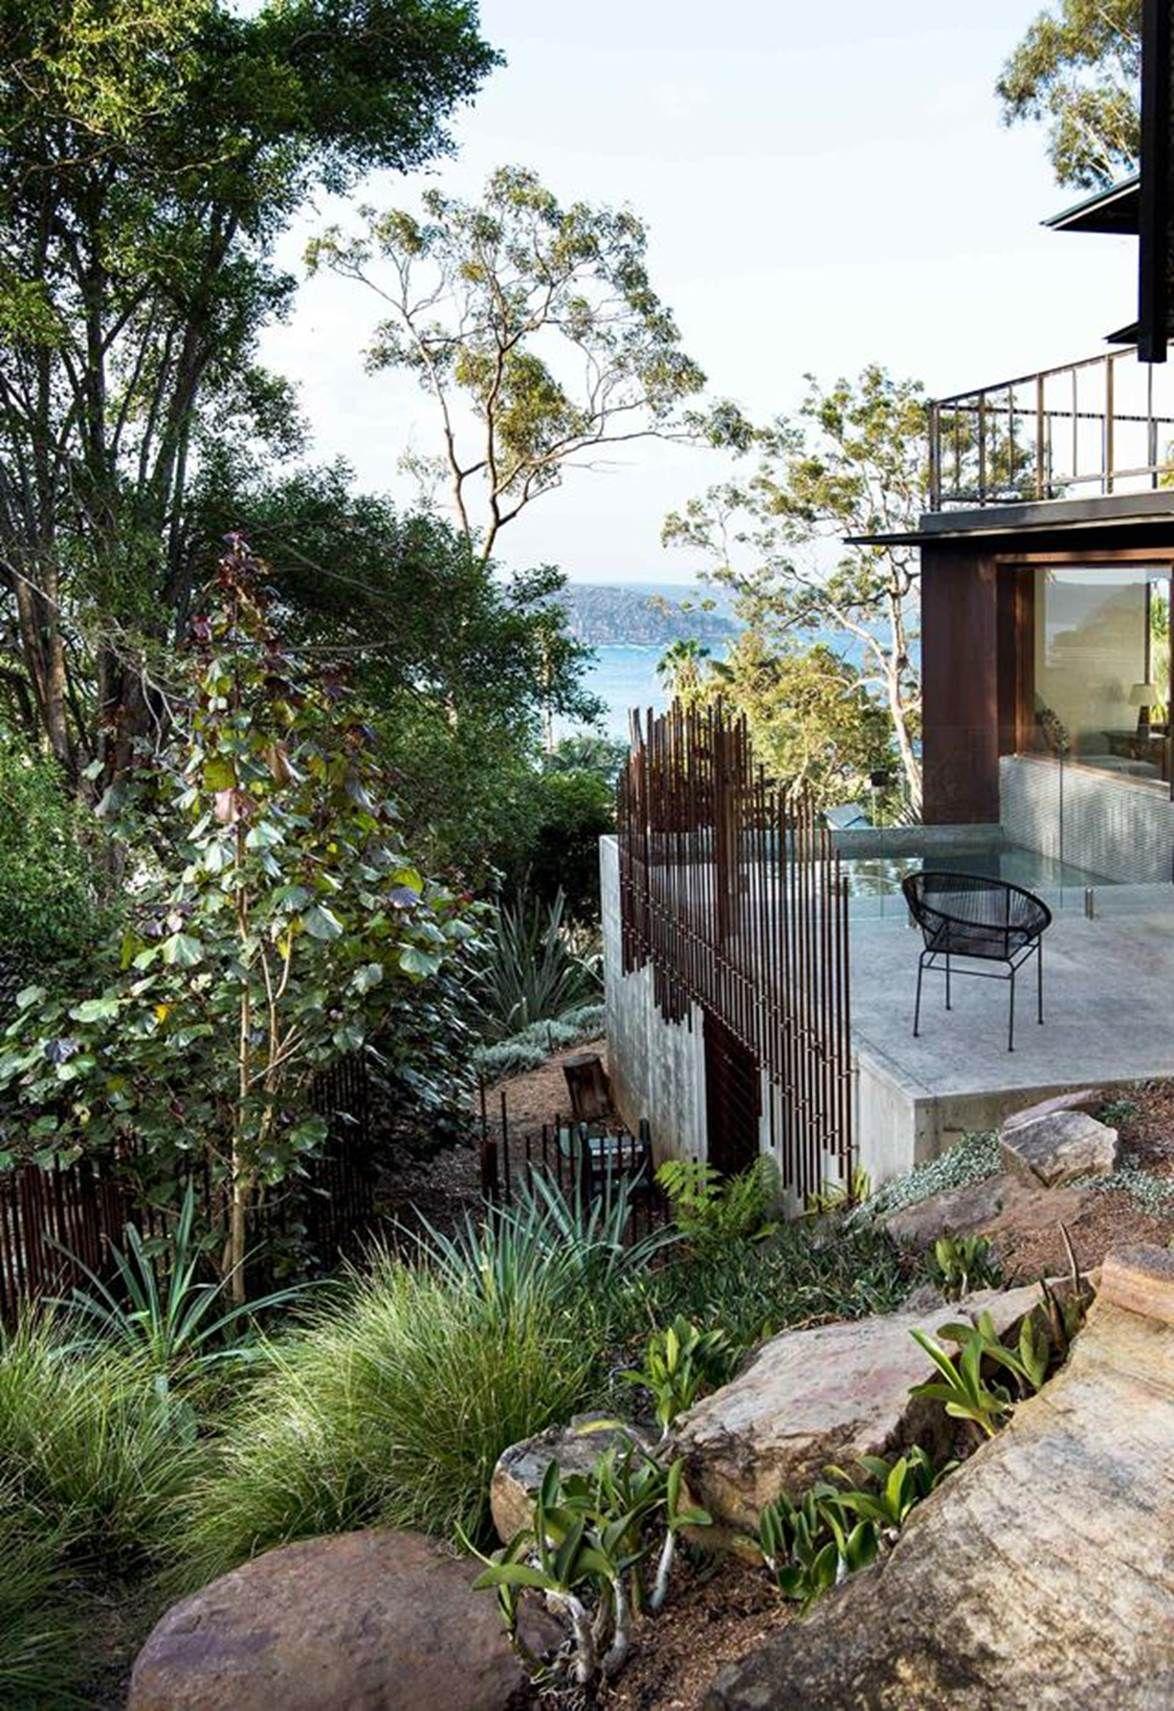 11 native Australian garden design ideas to inspire (With ...